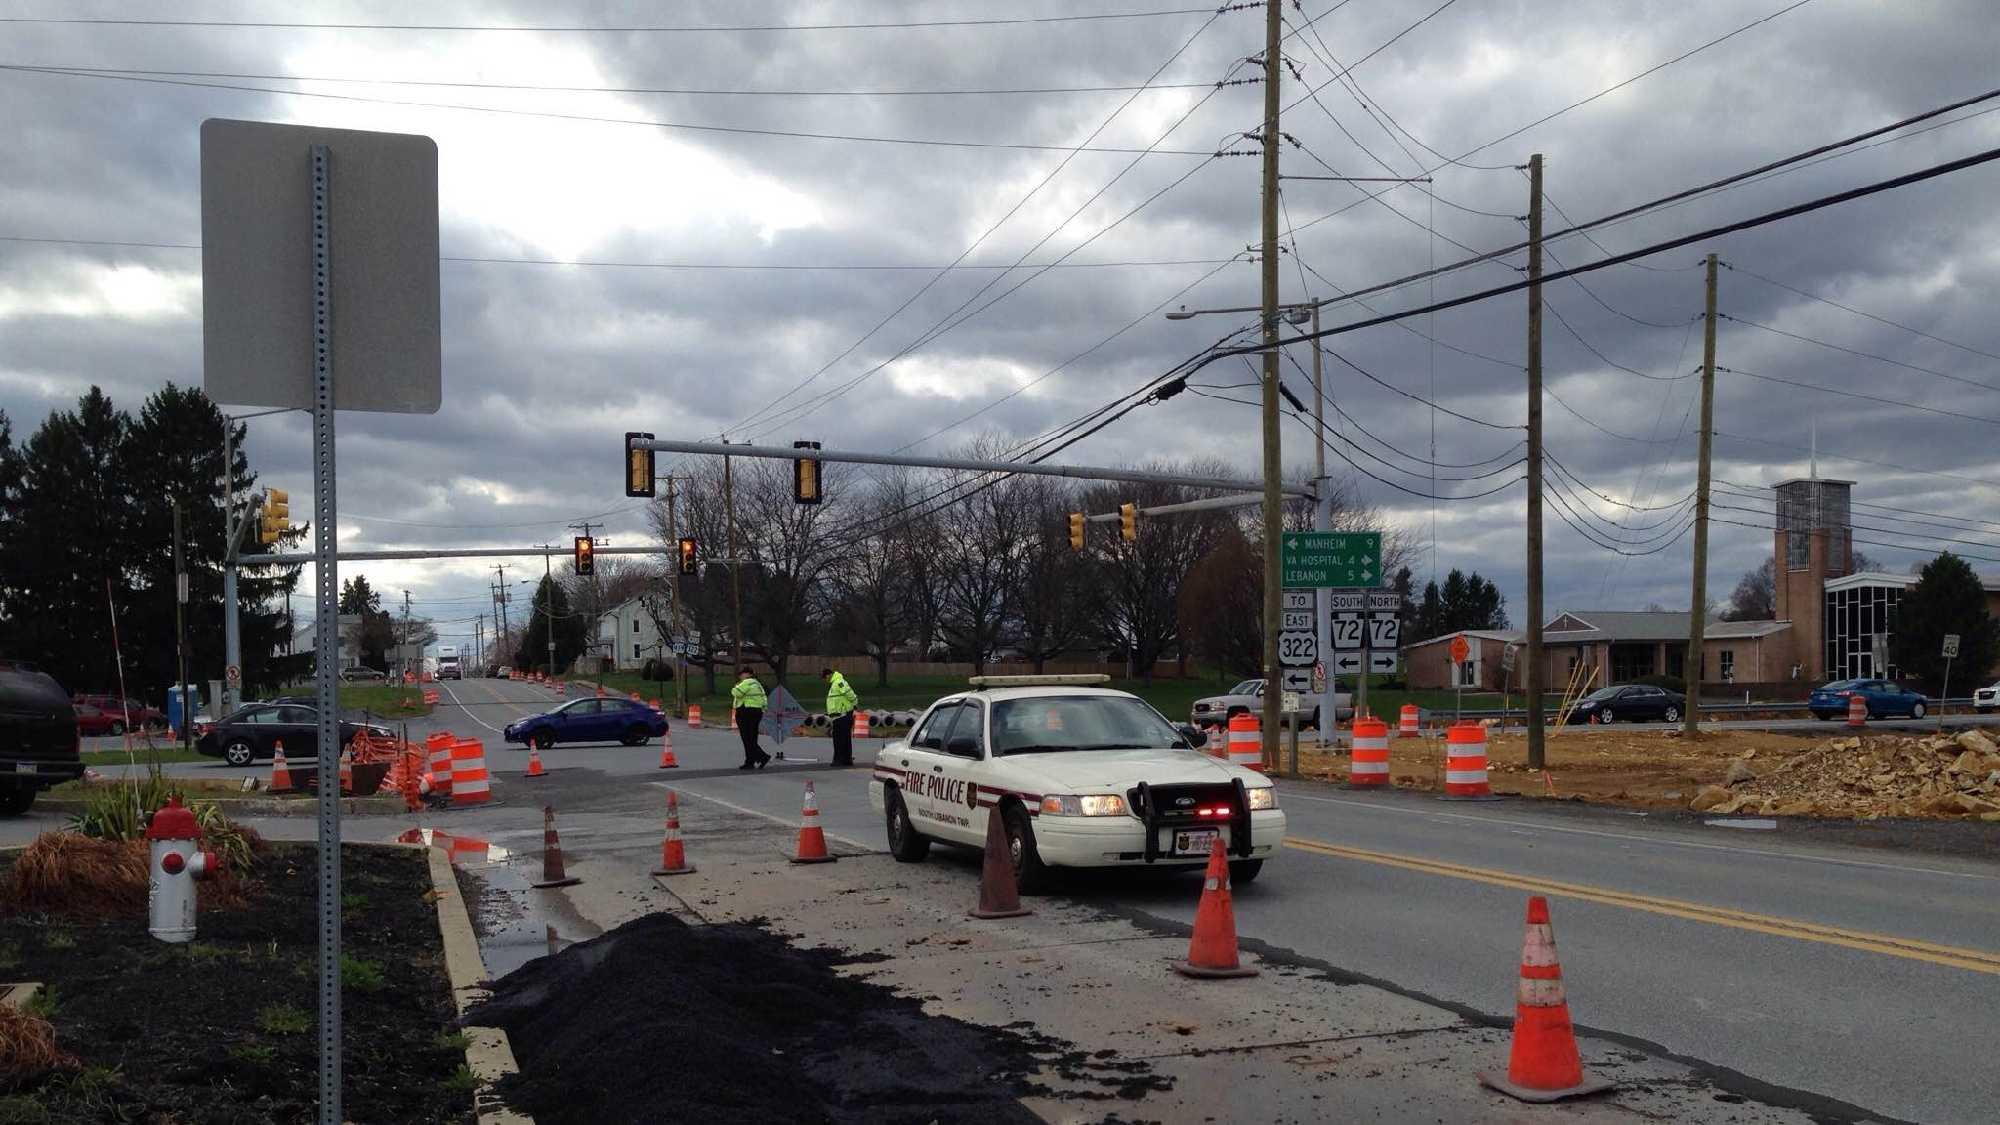 Crews on scene of fatal crash in Lebanon County